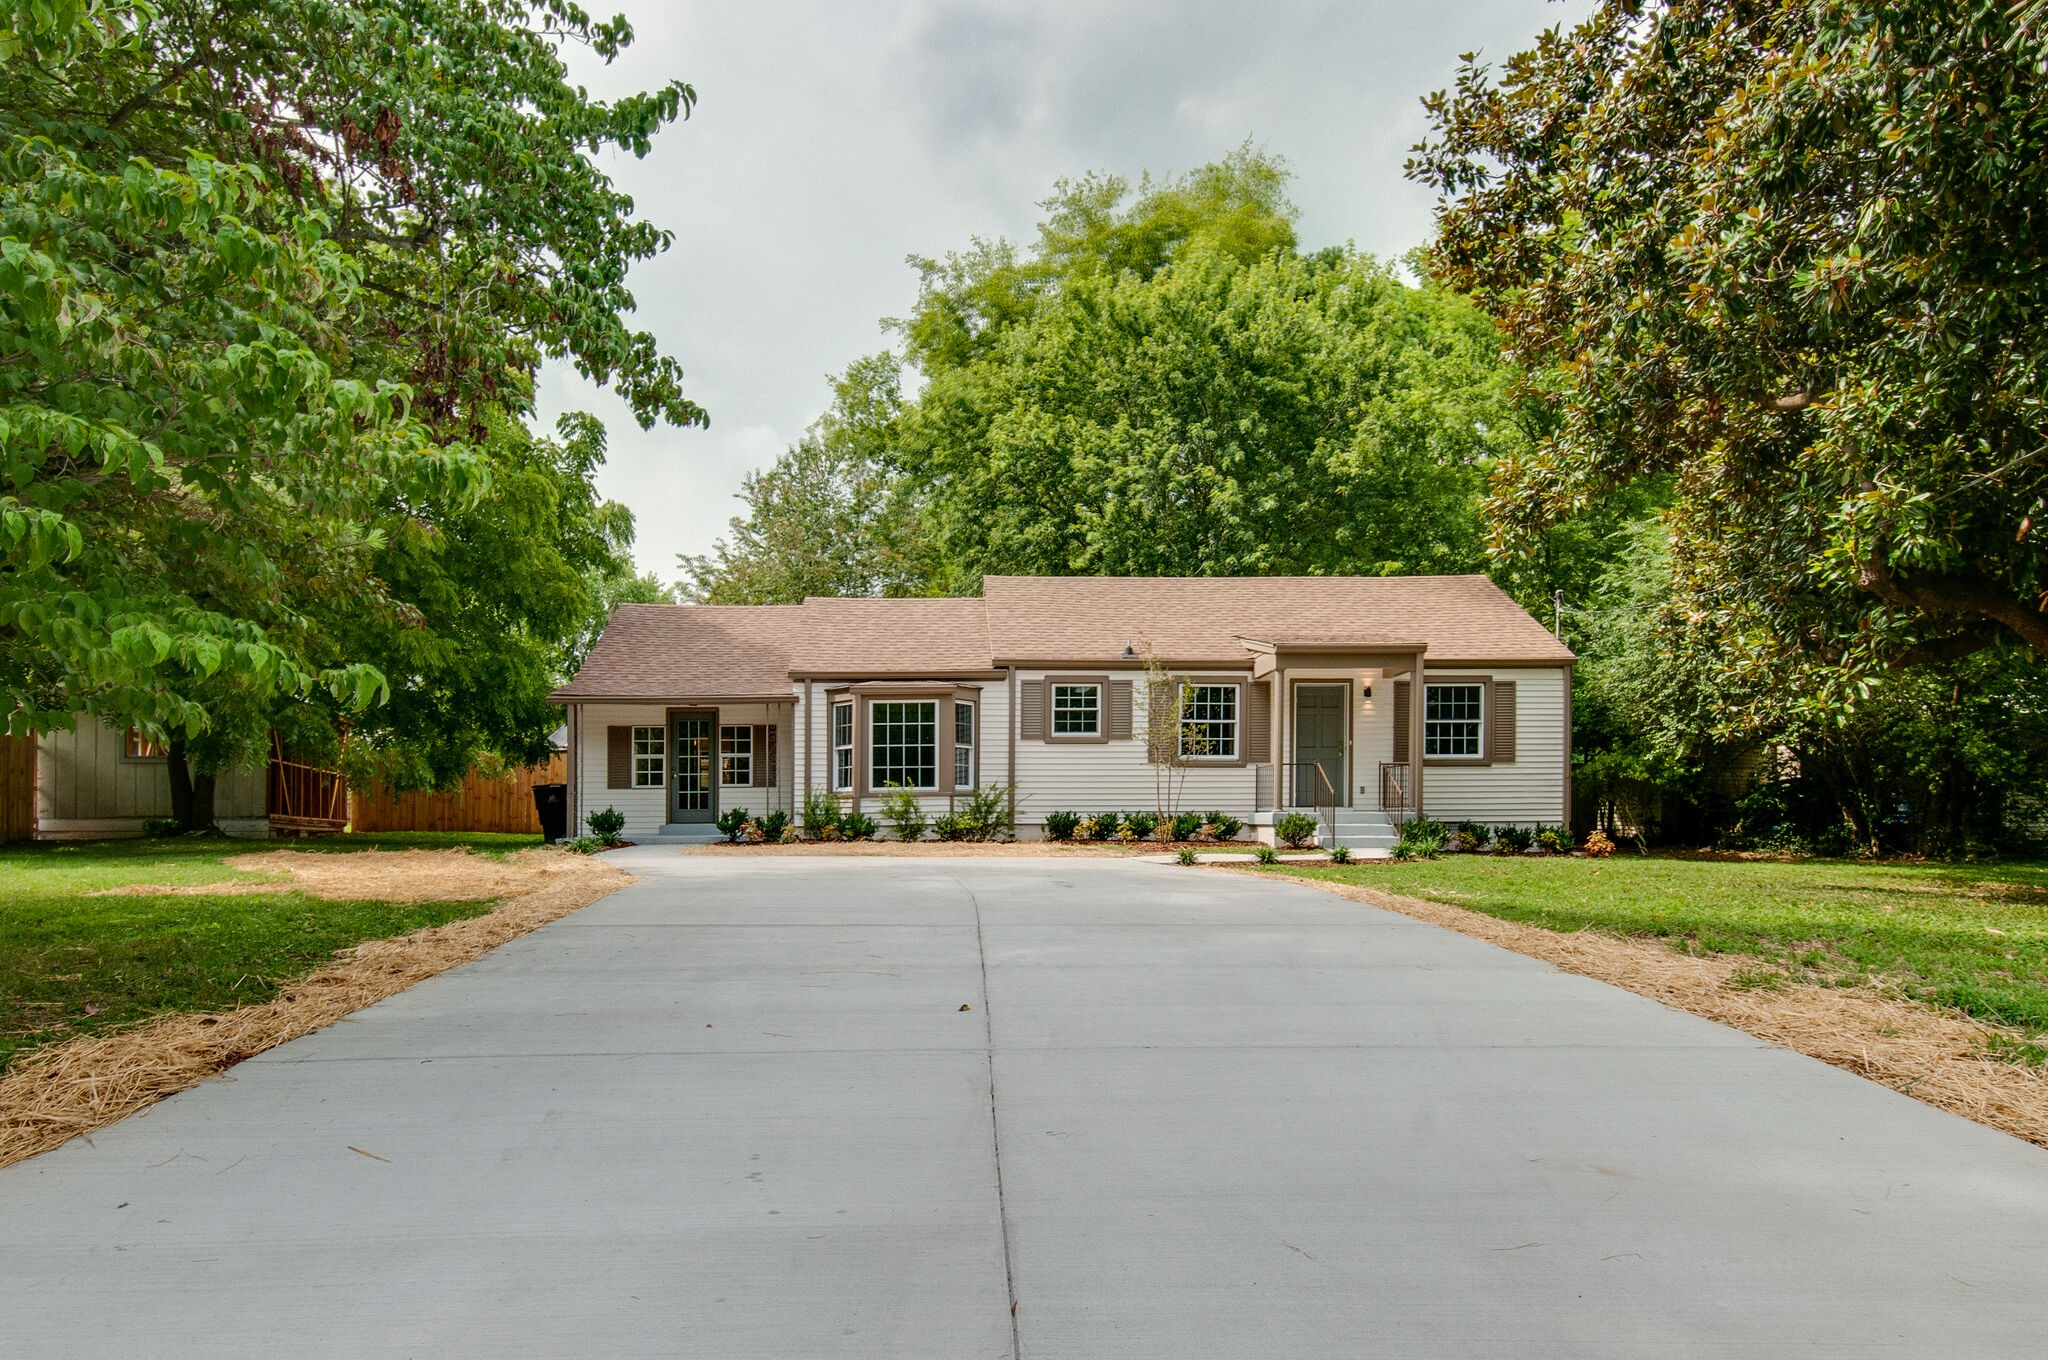 2817 Ennis Rd Property Photo - Nashville, TN real estate listing